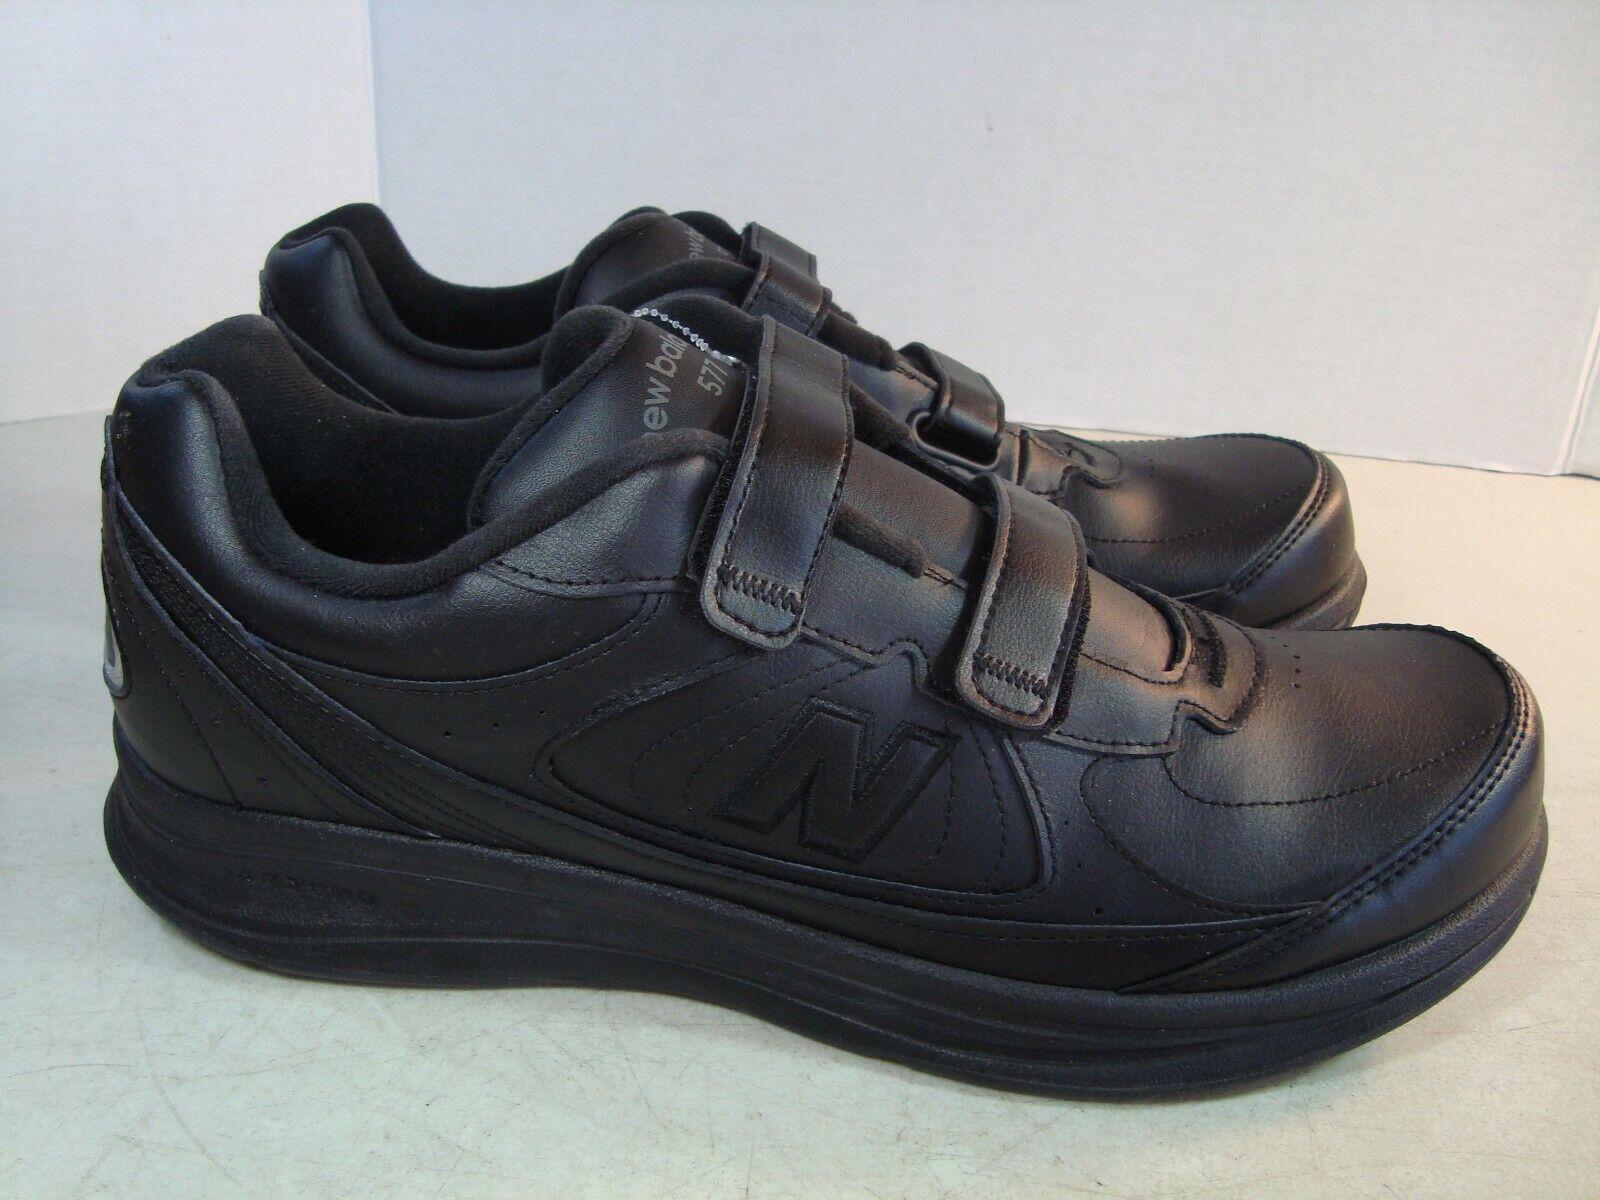 577 dsl 2 walking shoes mens 14